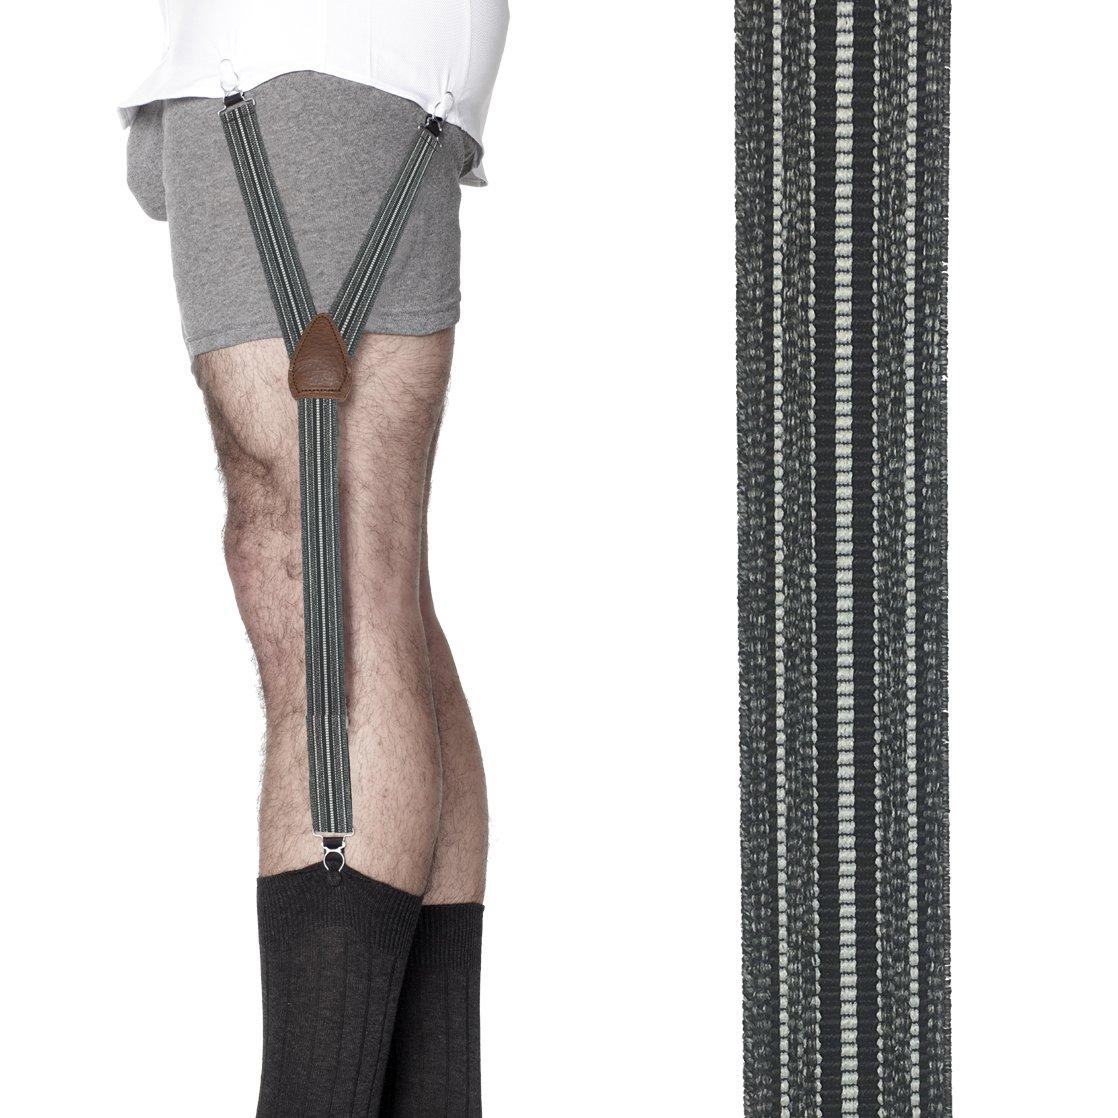 KK & Jay Supply Co. Shirttail Garters - Striped Shirt Stays (Heather Grey)